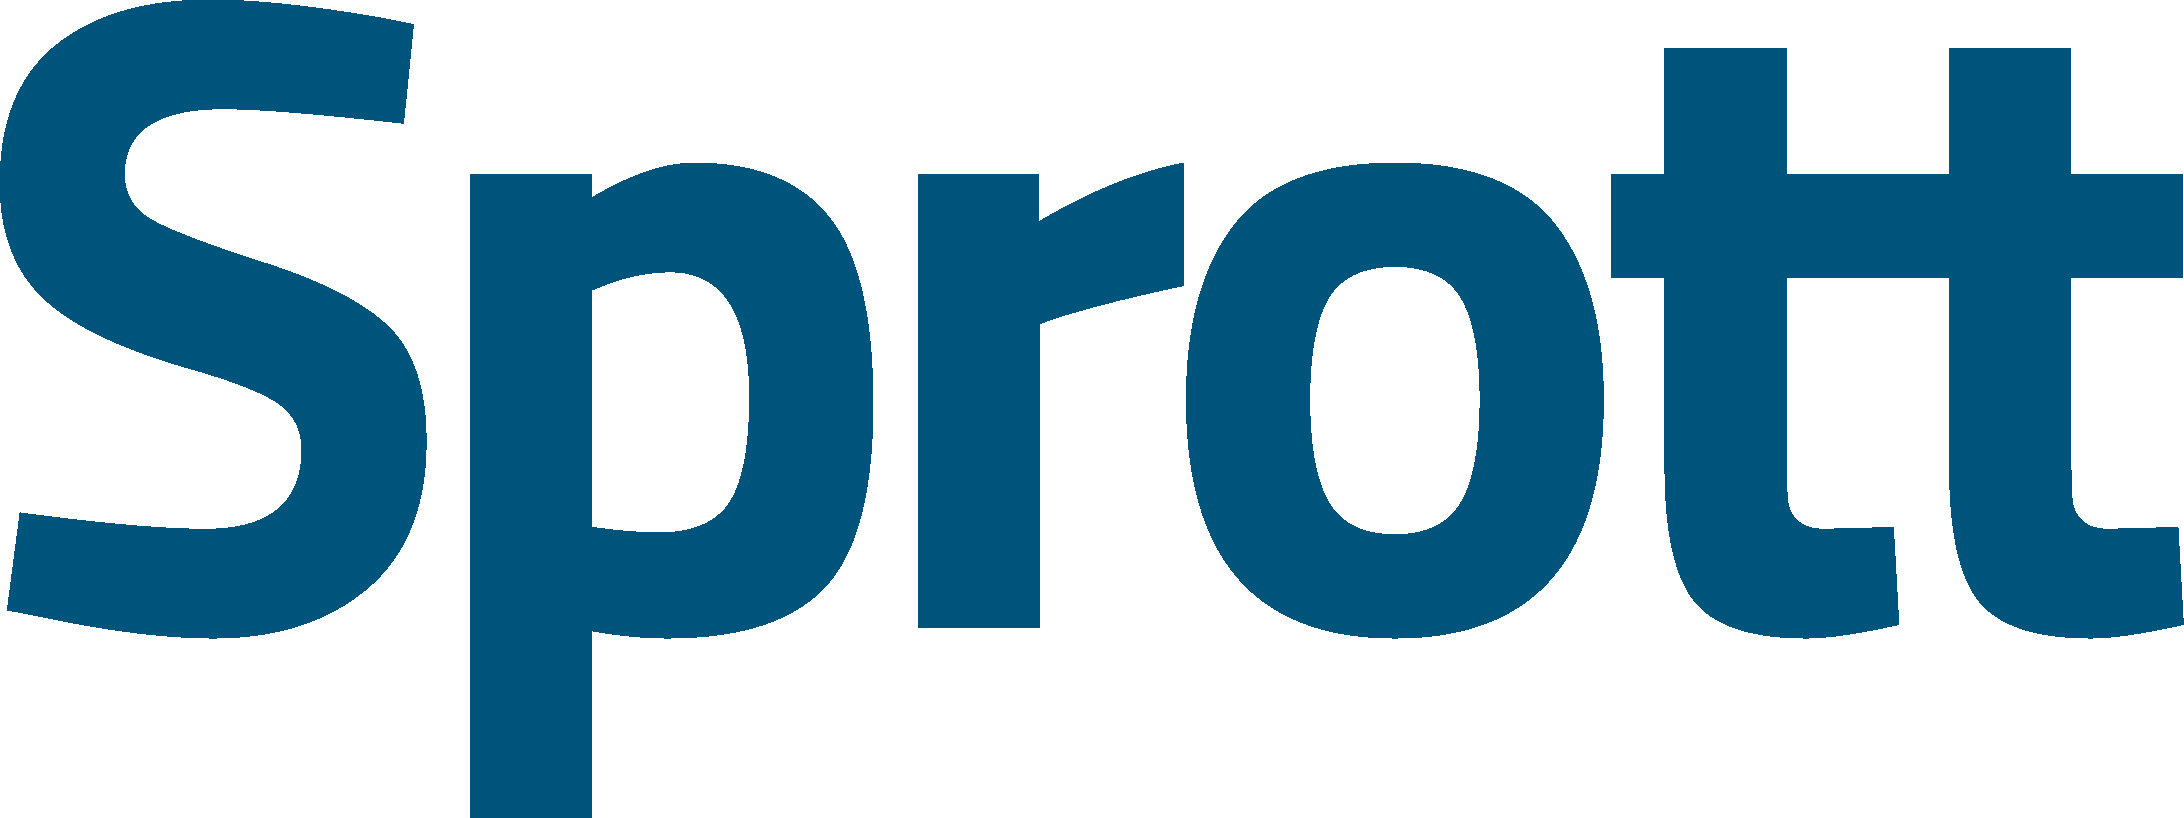 Sprott Inc